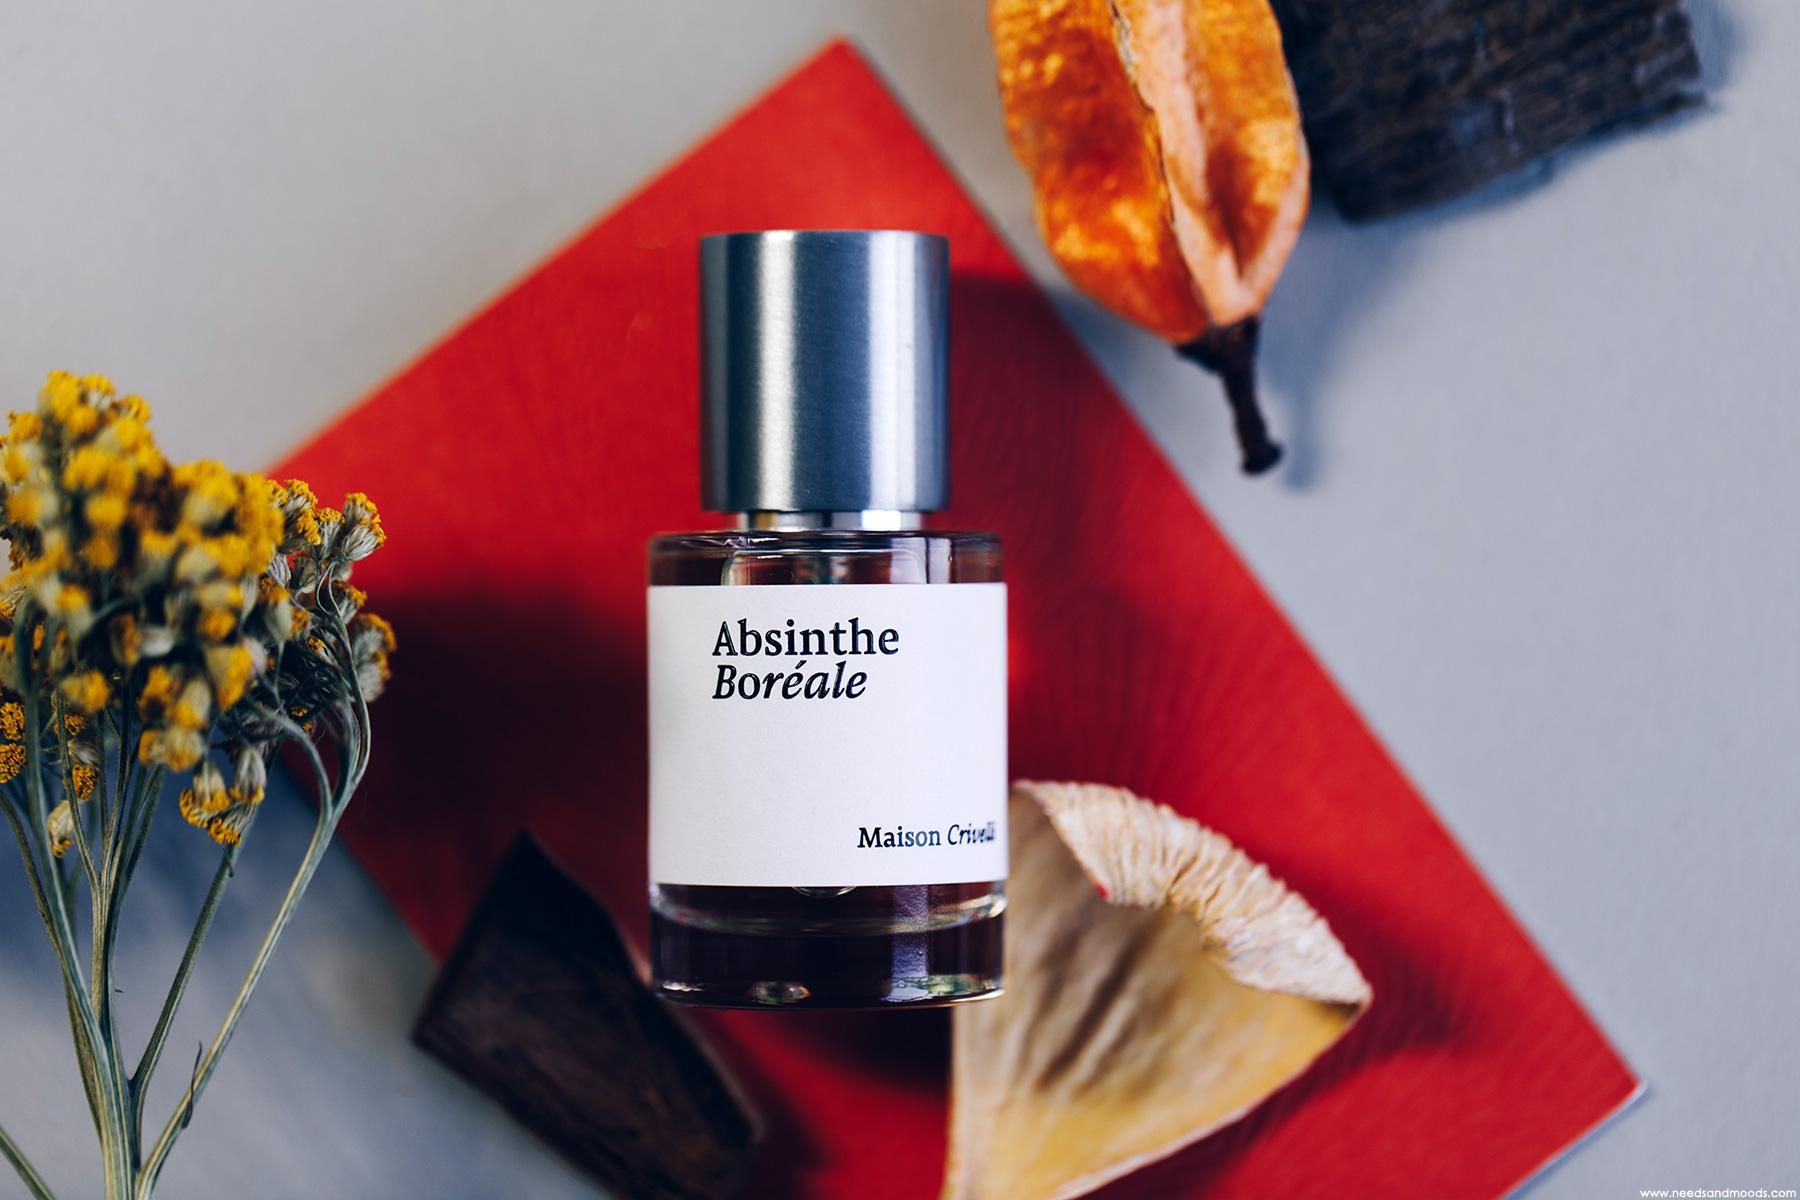 absinthe boreale maison crivelli